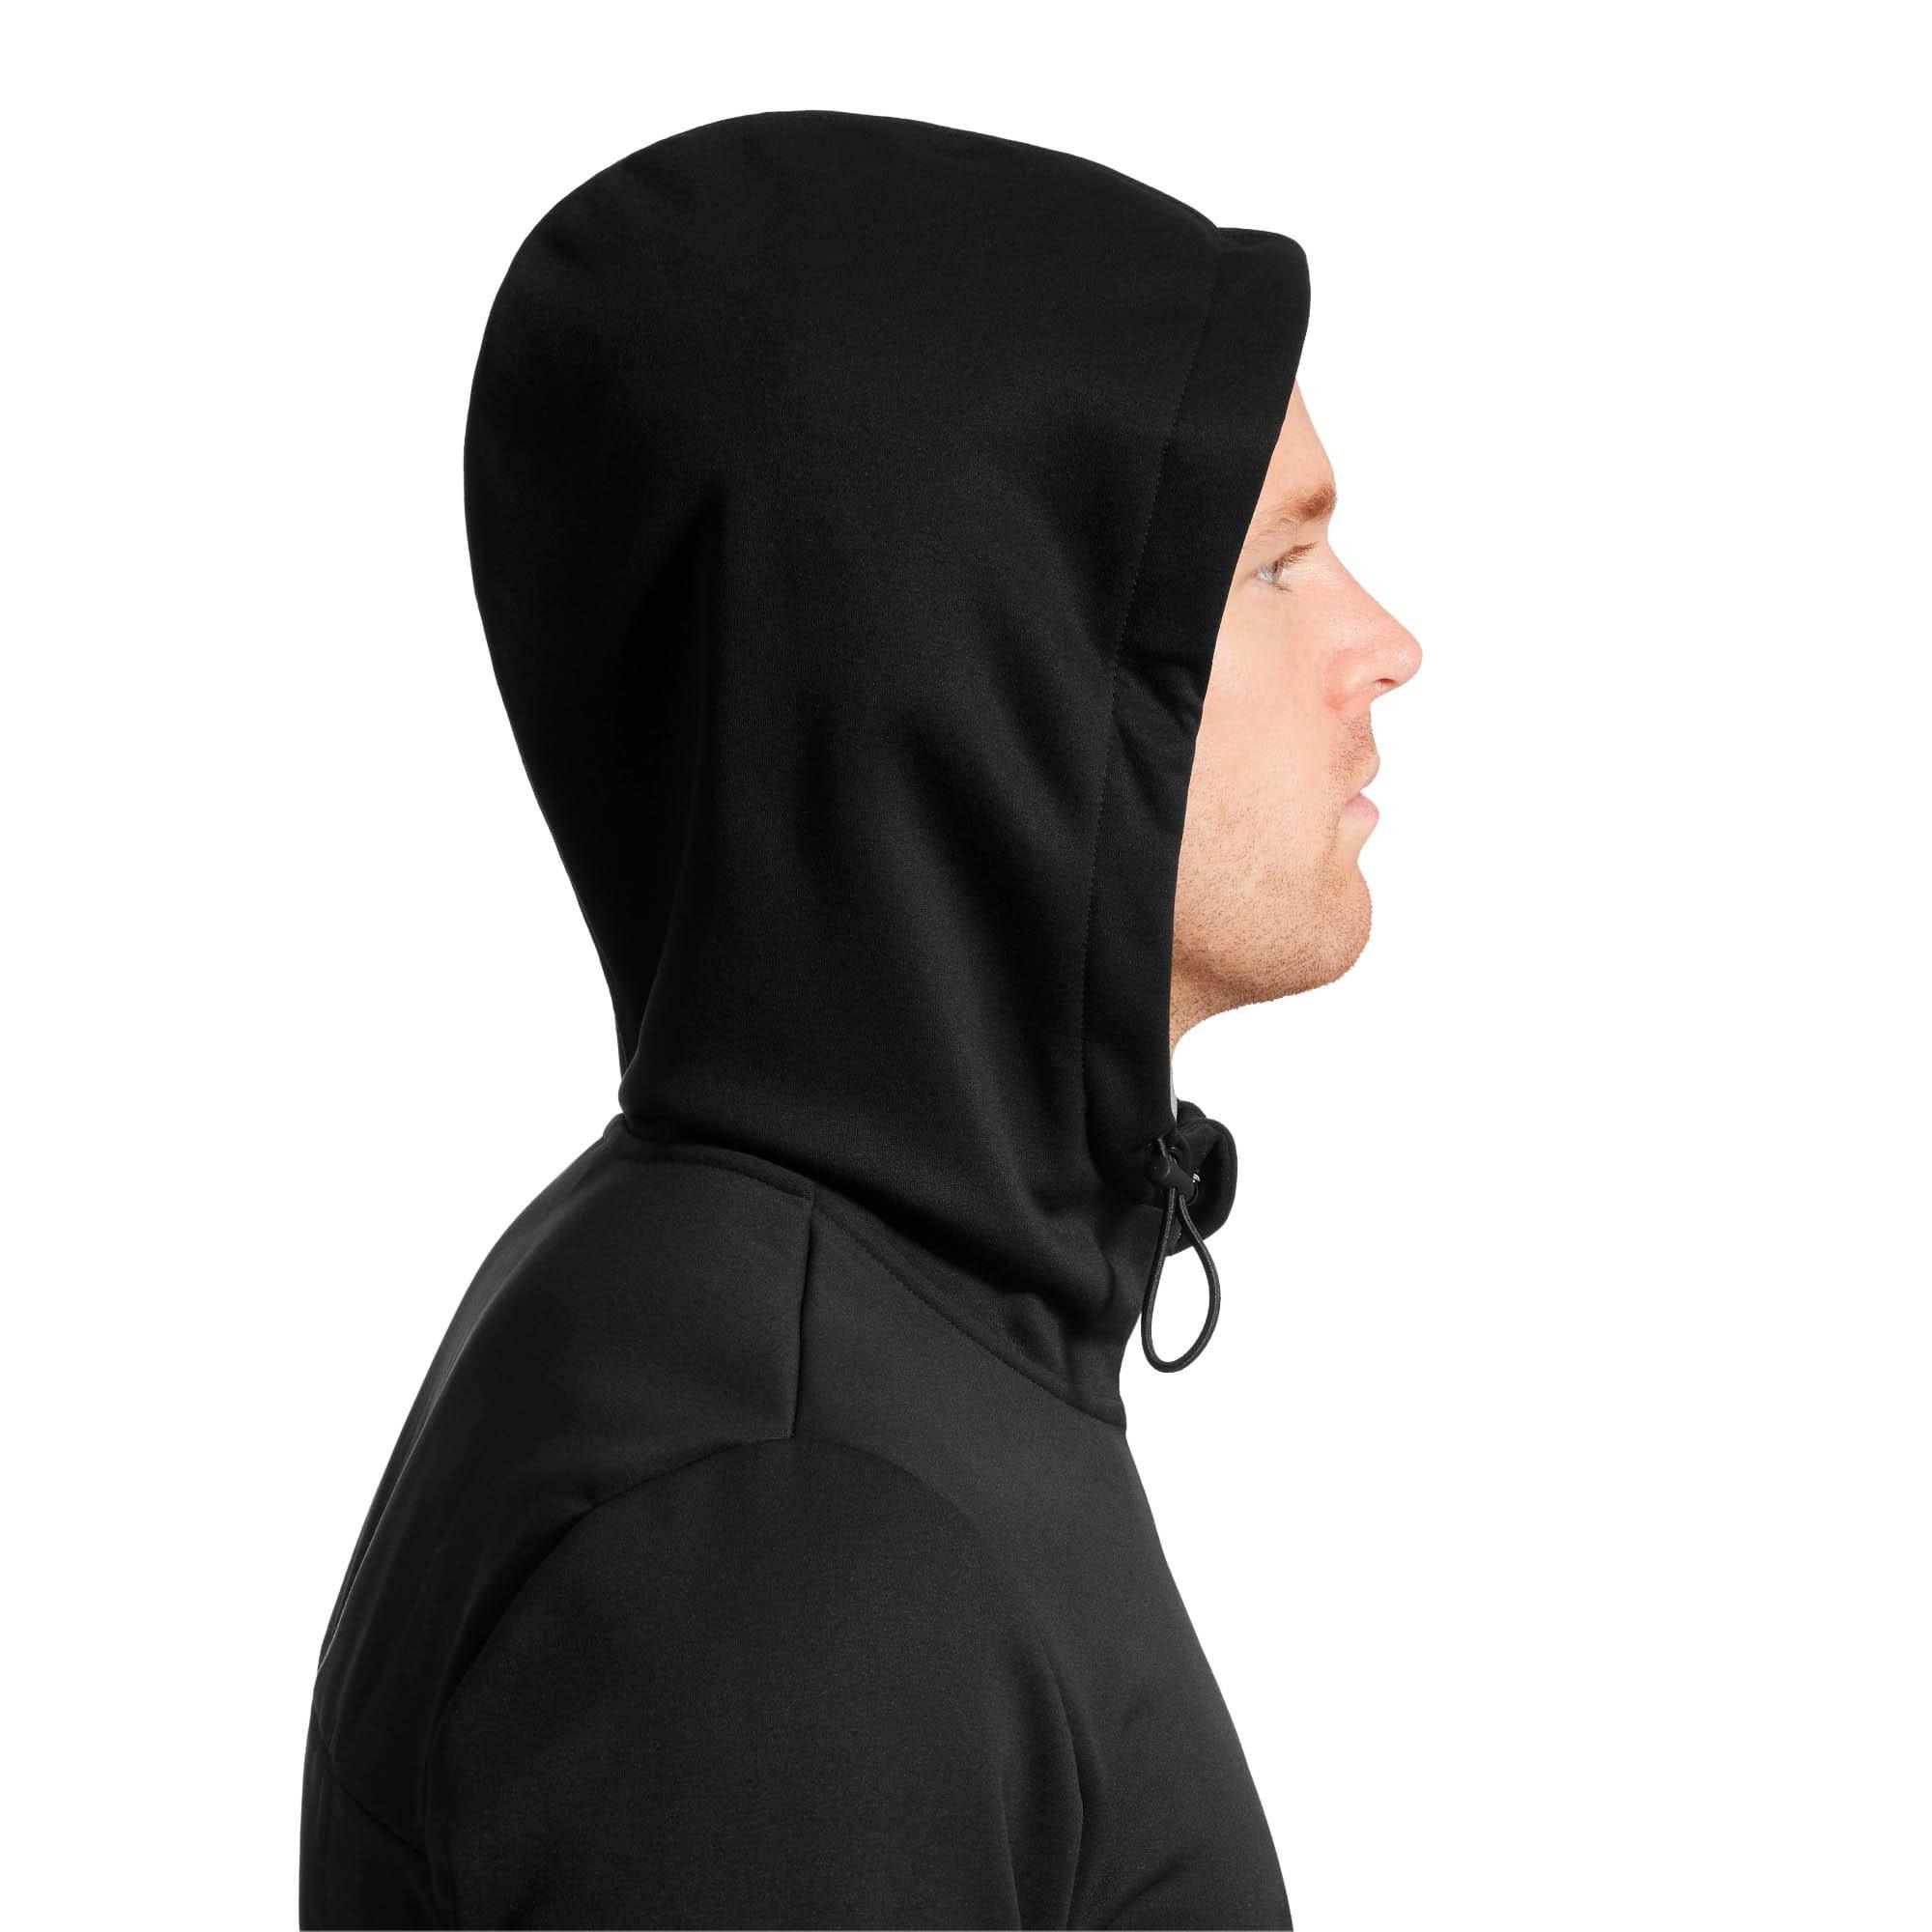 Thumbnail 3 of Tec Sports Warm Full-Zip Hoodie, Puma Black, medium